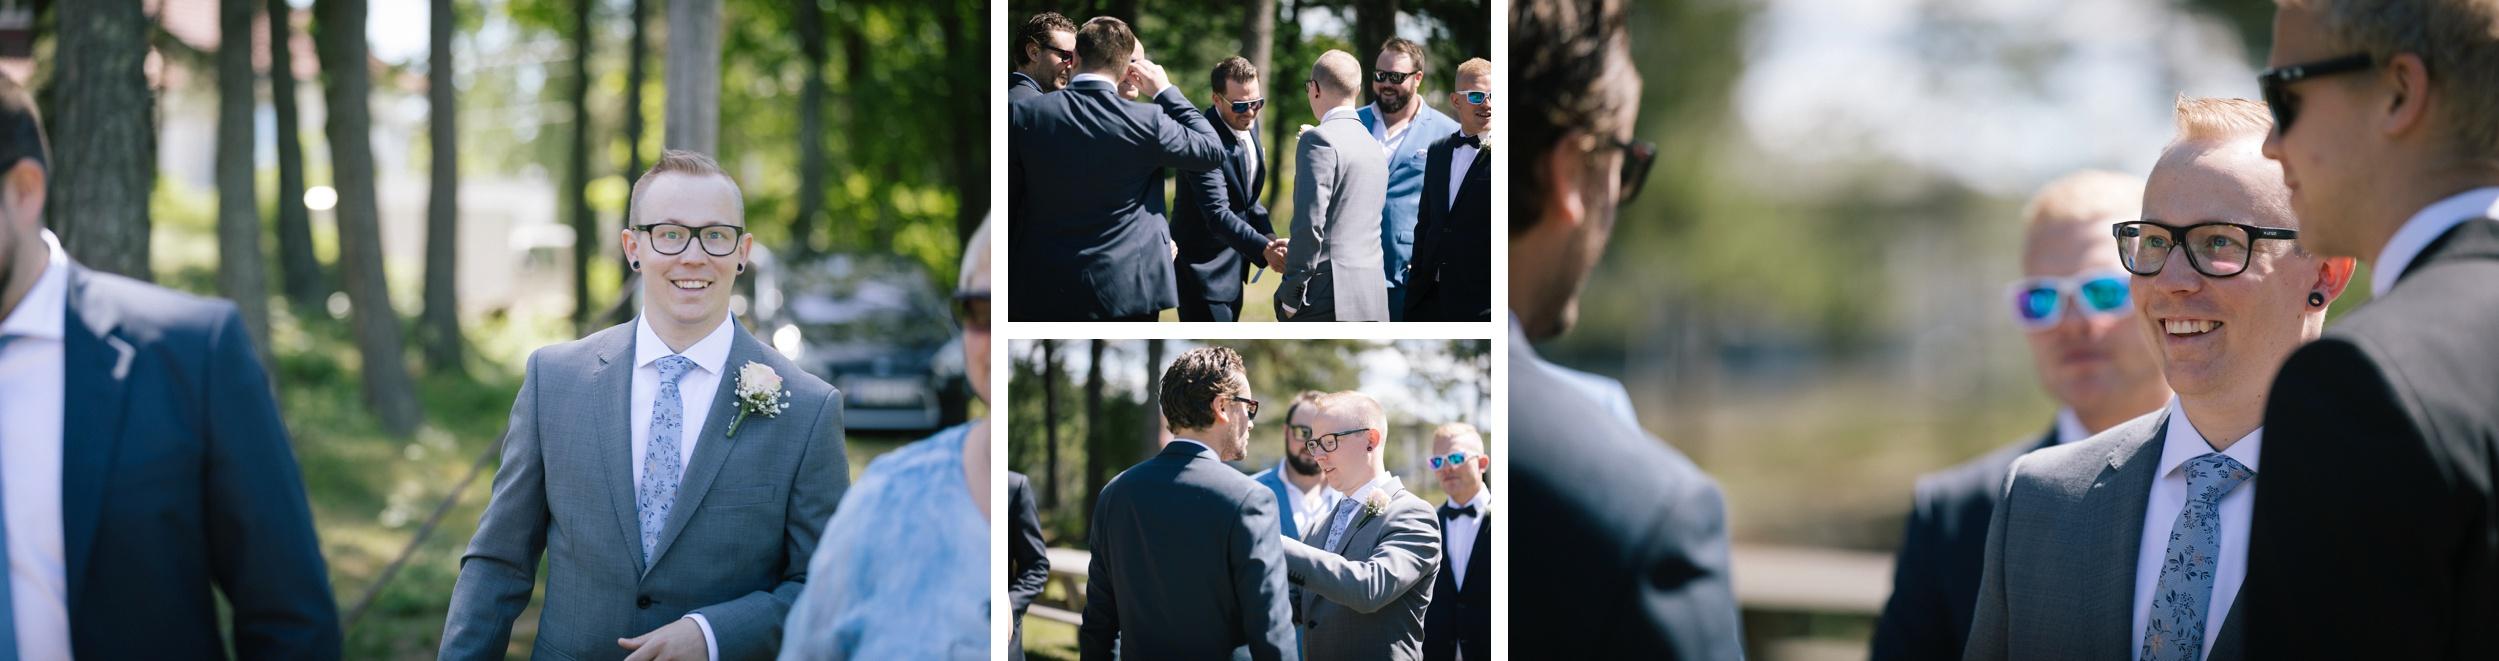 bryllup-bryllupsfotografering-bryllupsfotograf-sarpsborg-20170617-_H2A1735anneli_phillip_WEB.jpg